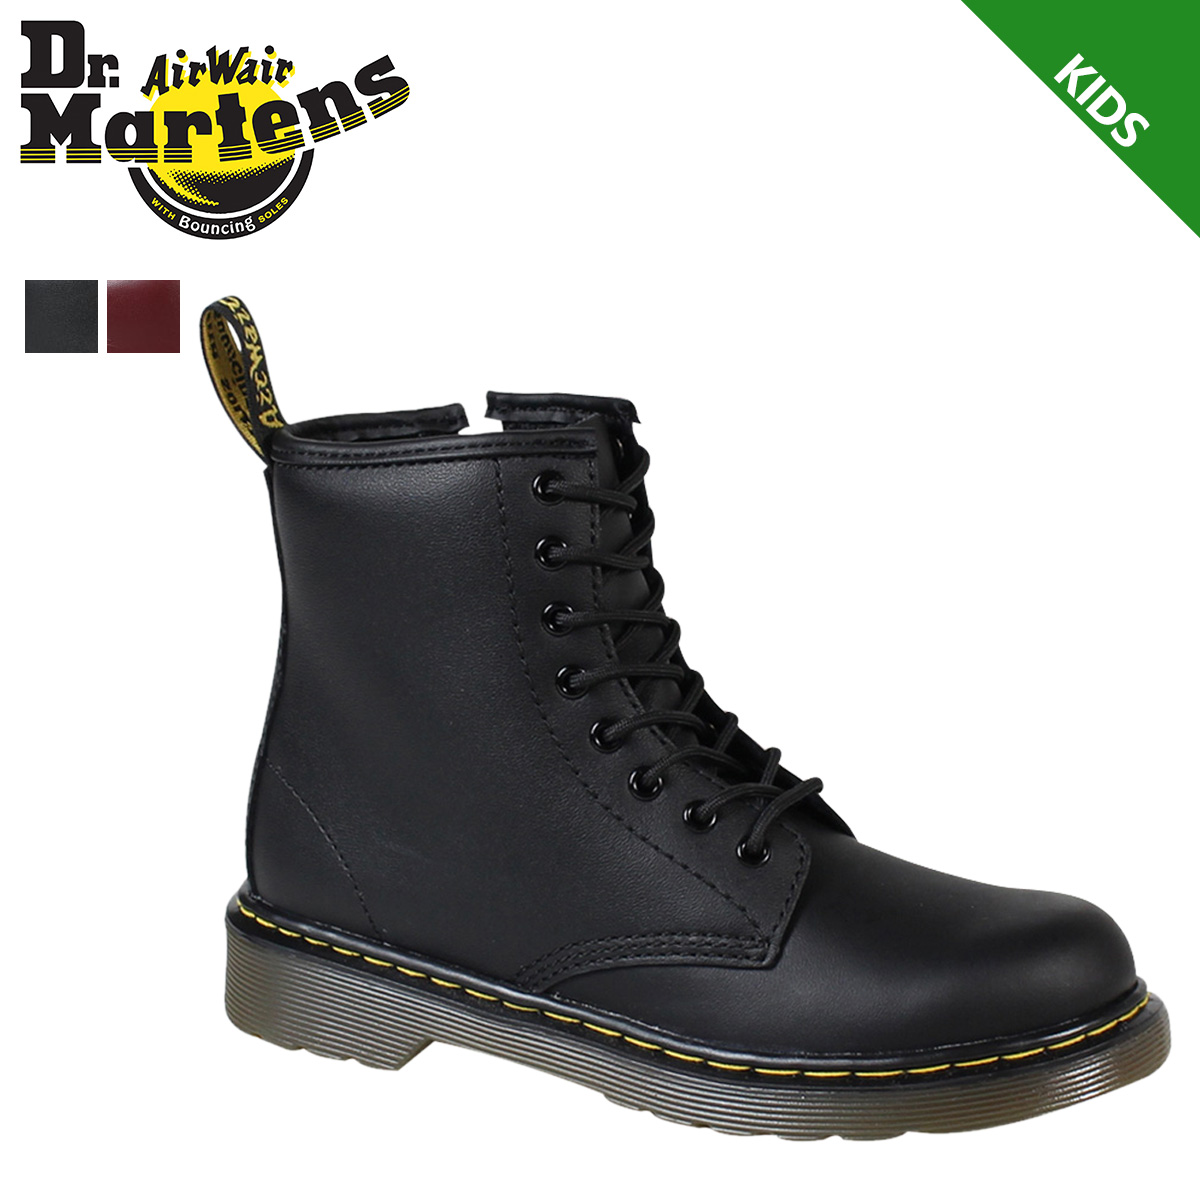 ALLSPORTS  Dr. Martens Dr.Martens 8 hole boots kids CORE DM J BOOT ... 89b86efc5a40